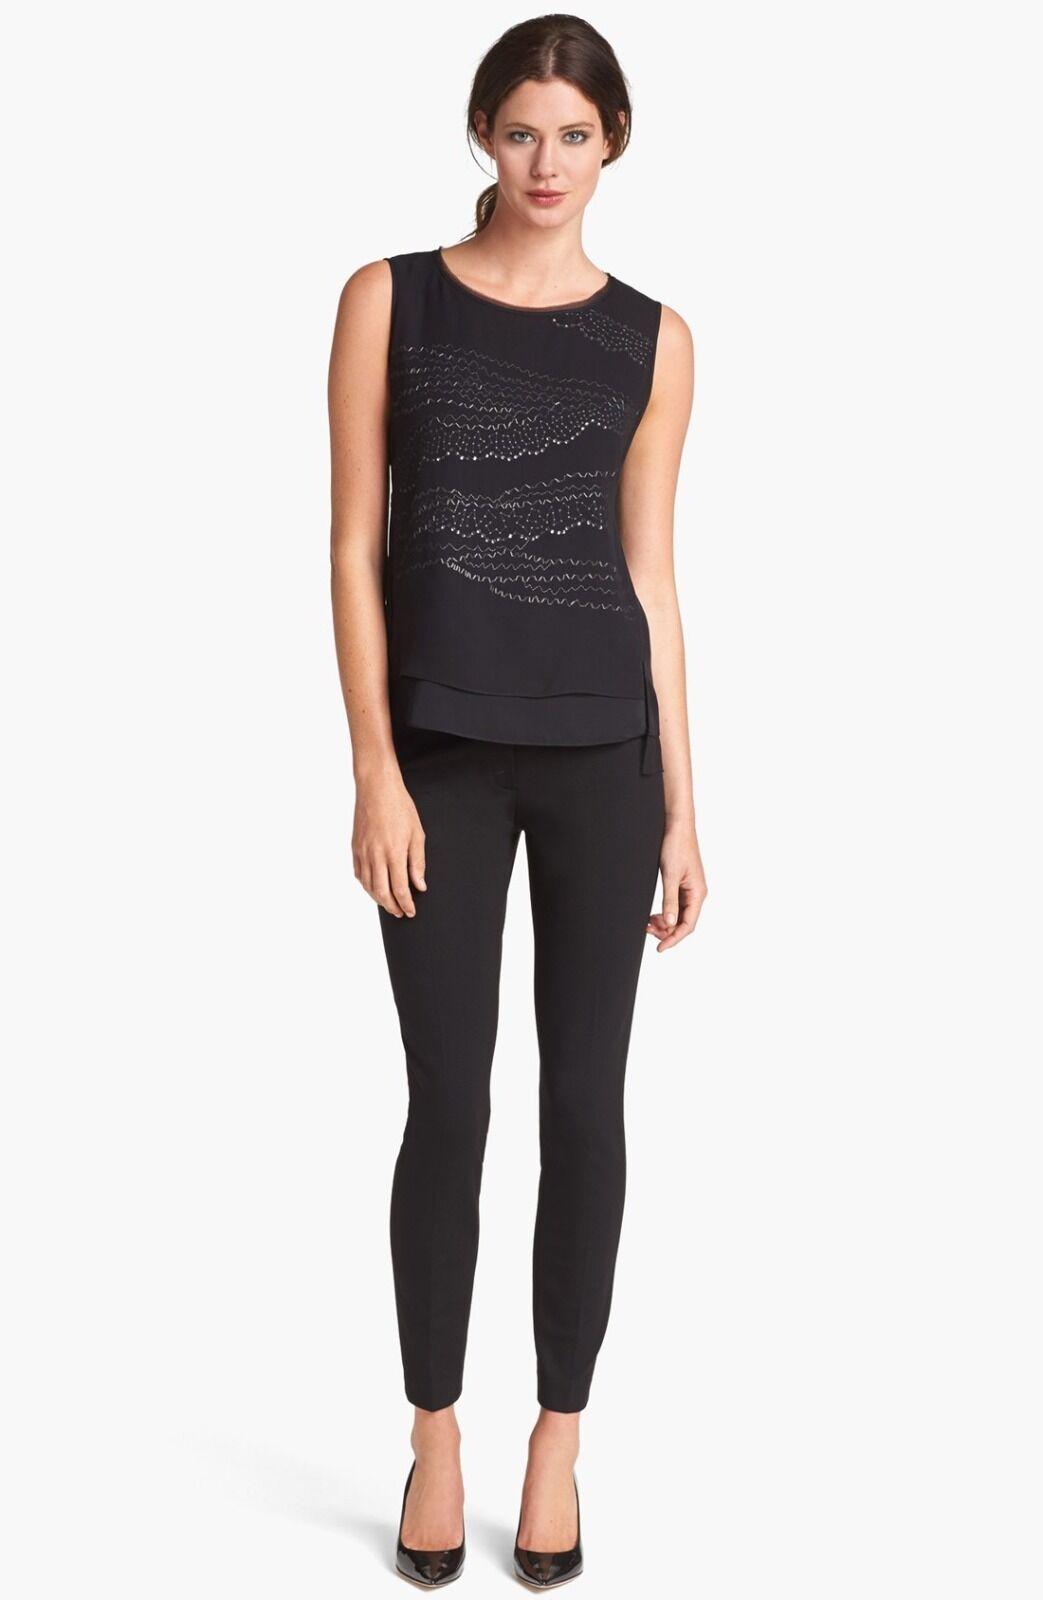 ELIE TAHARI schwarz Silk And Sequin Sleeveless 'Jenna' Blouse Top. NWT X-Small